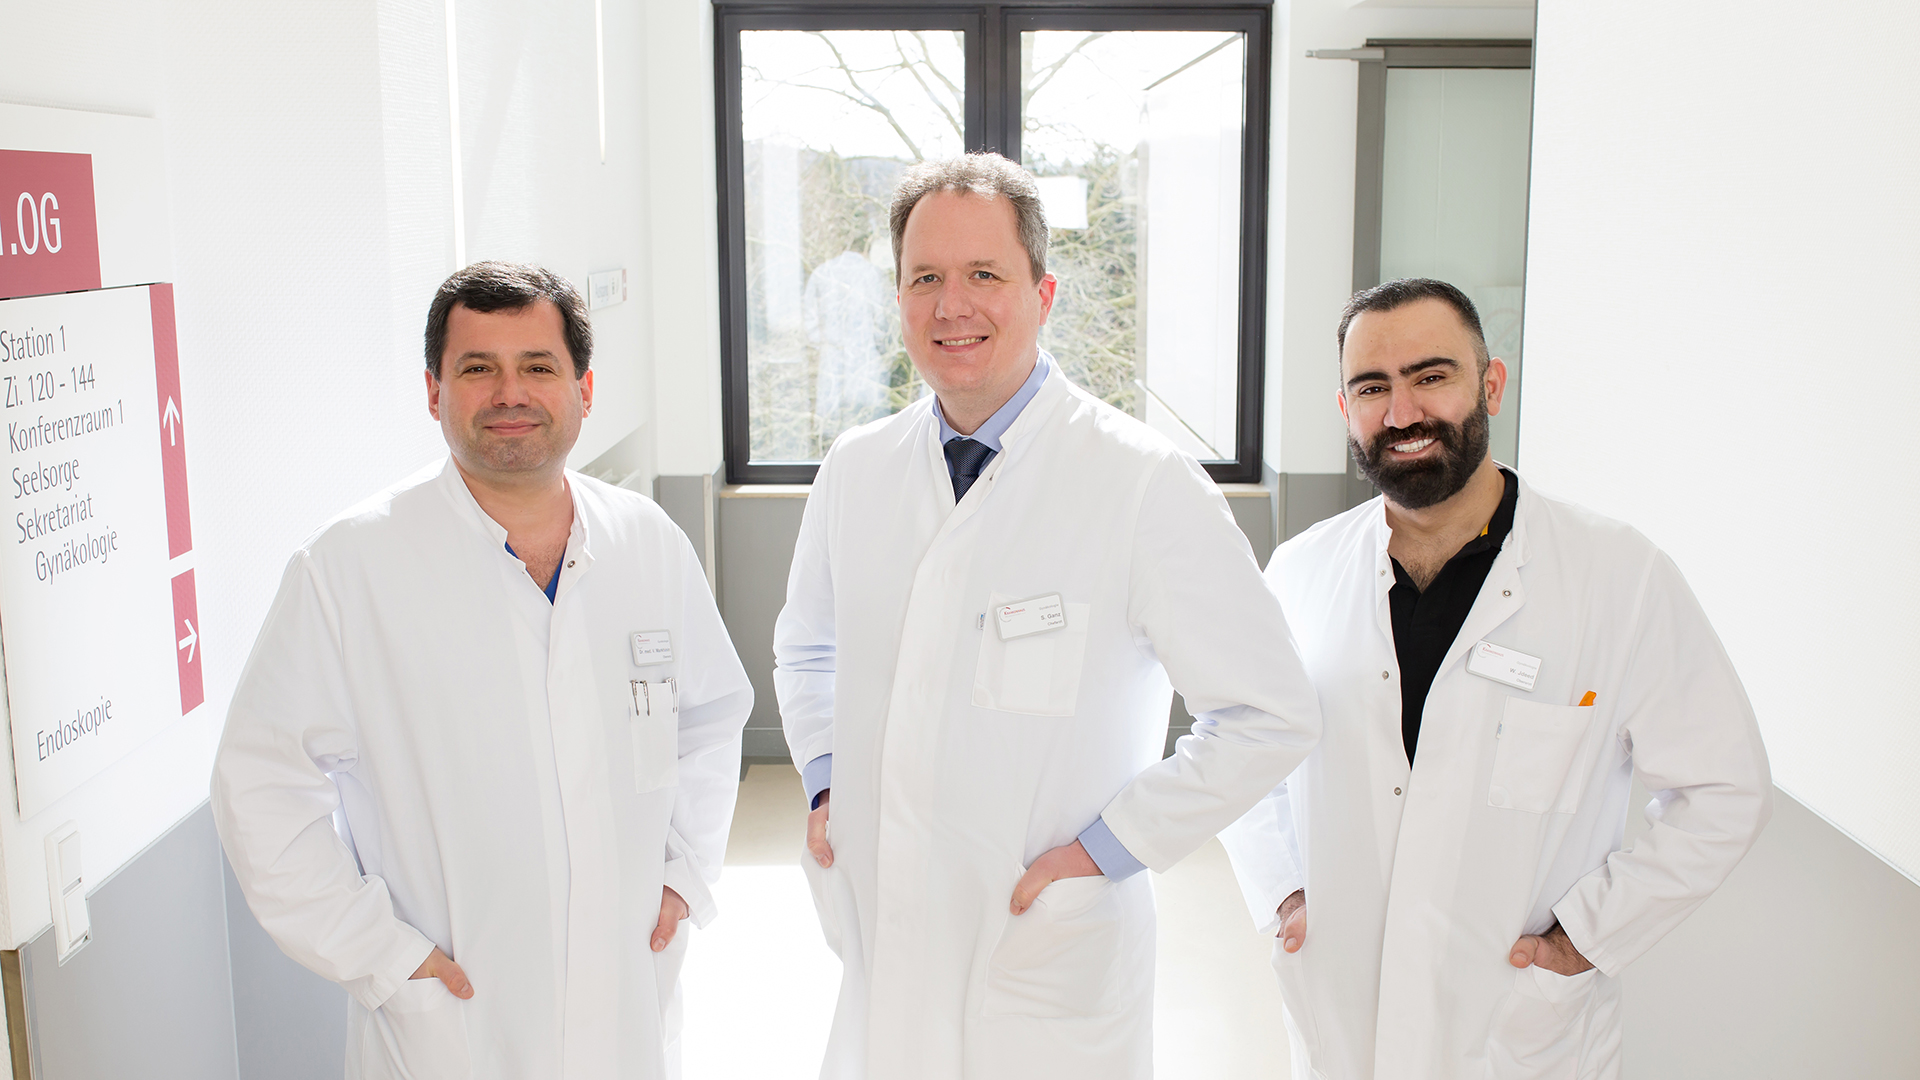 Krankenhaus Wermelskirchen GmbH - Medizin. Gynäkologie. Profil